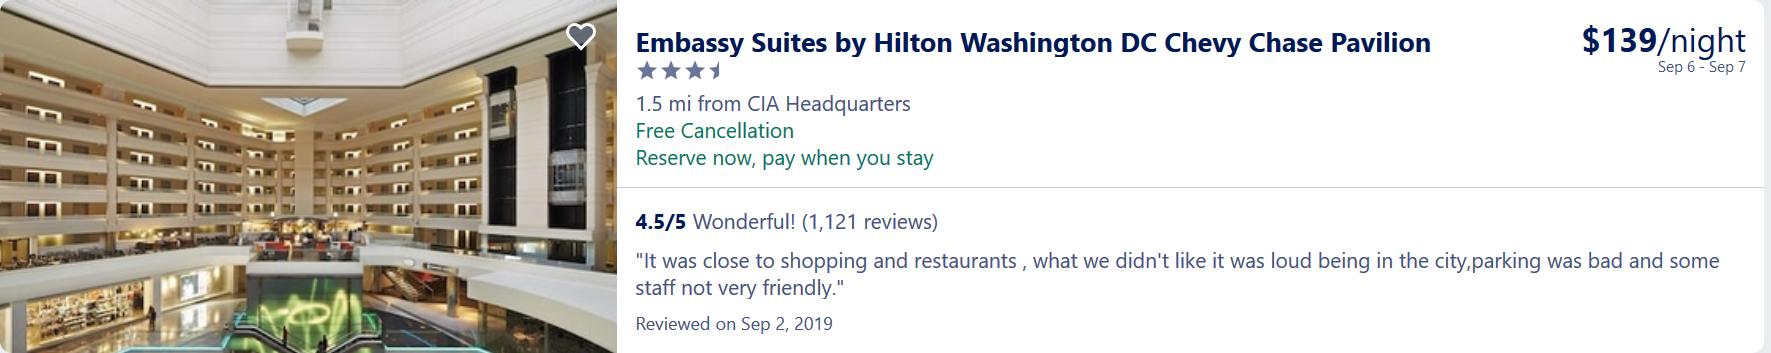 Strzok running ops in the Hilton? -brassballs blog